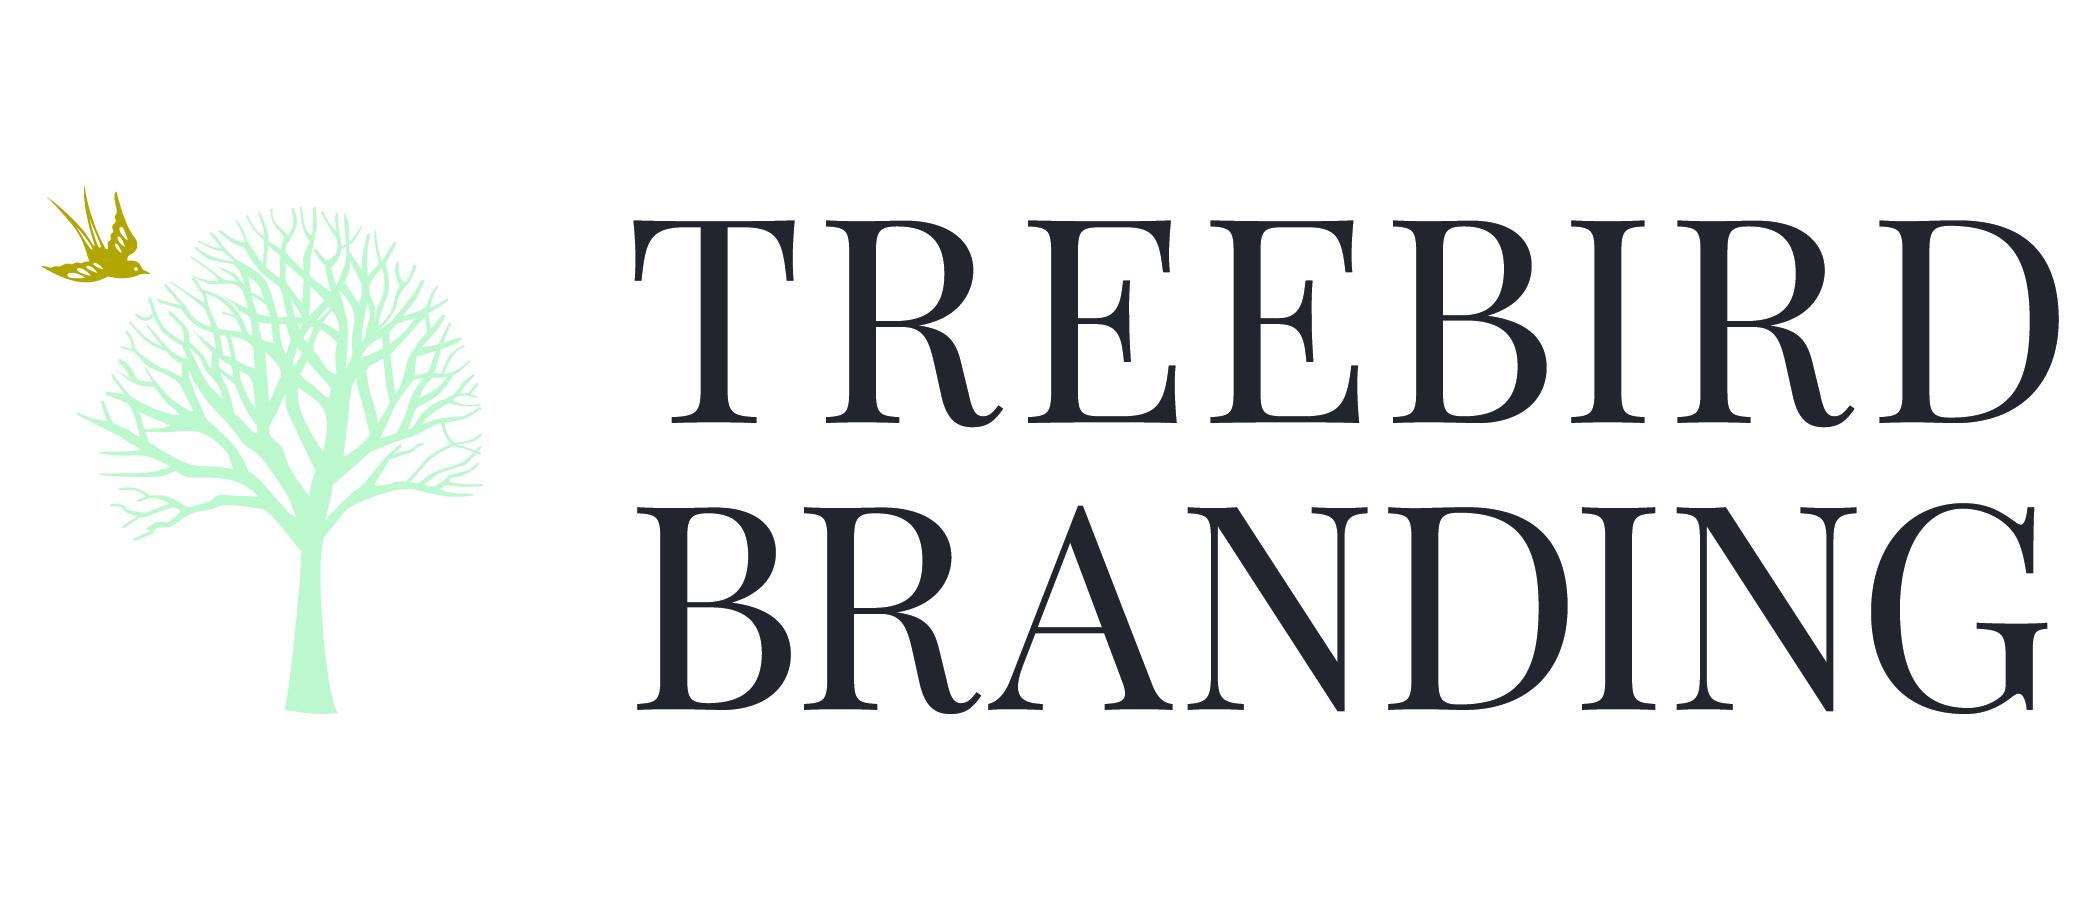 Treebird Branding